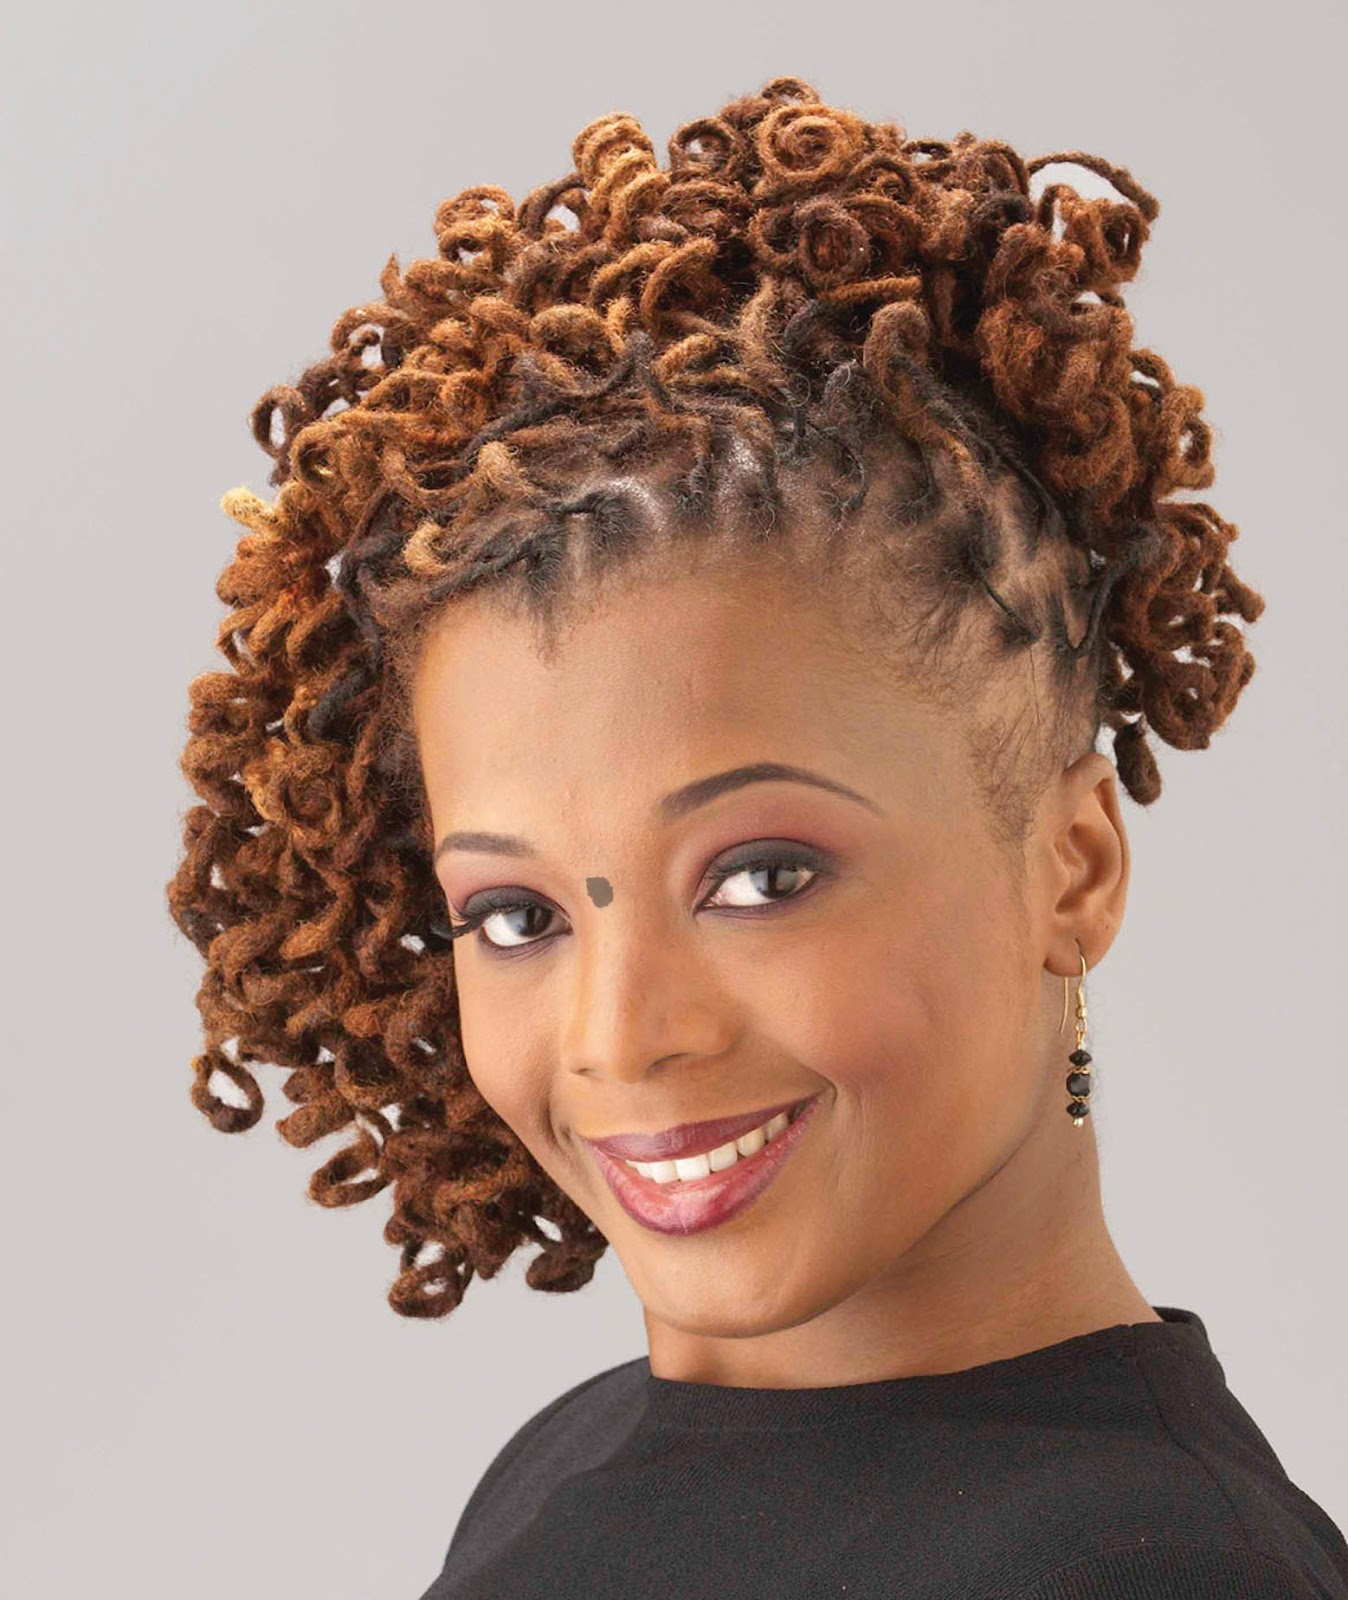 Hairstyle dreadlocks photos - Curly Locs Dreadlock Hairstyles